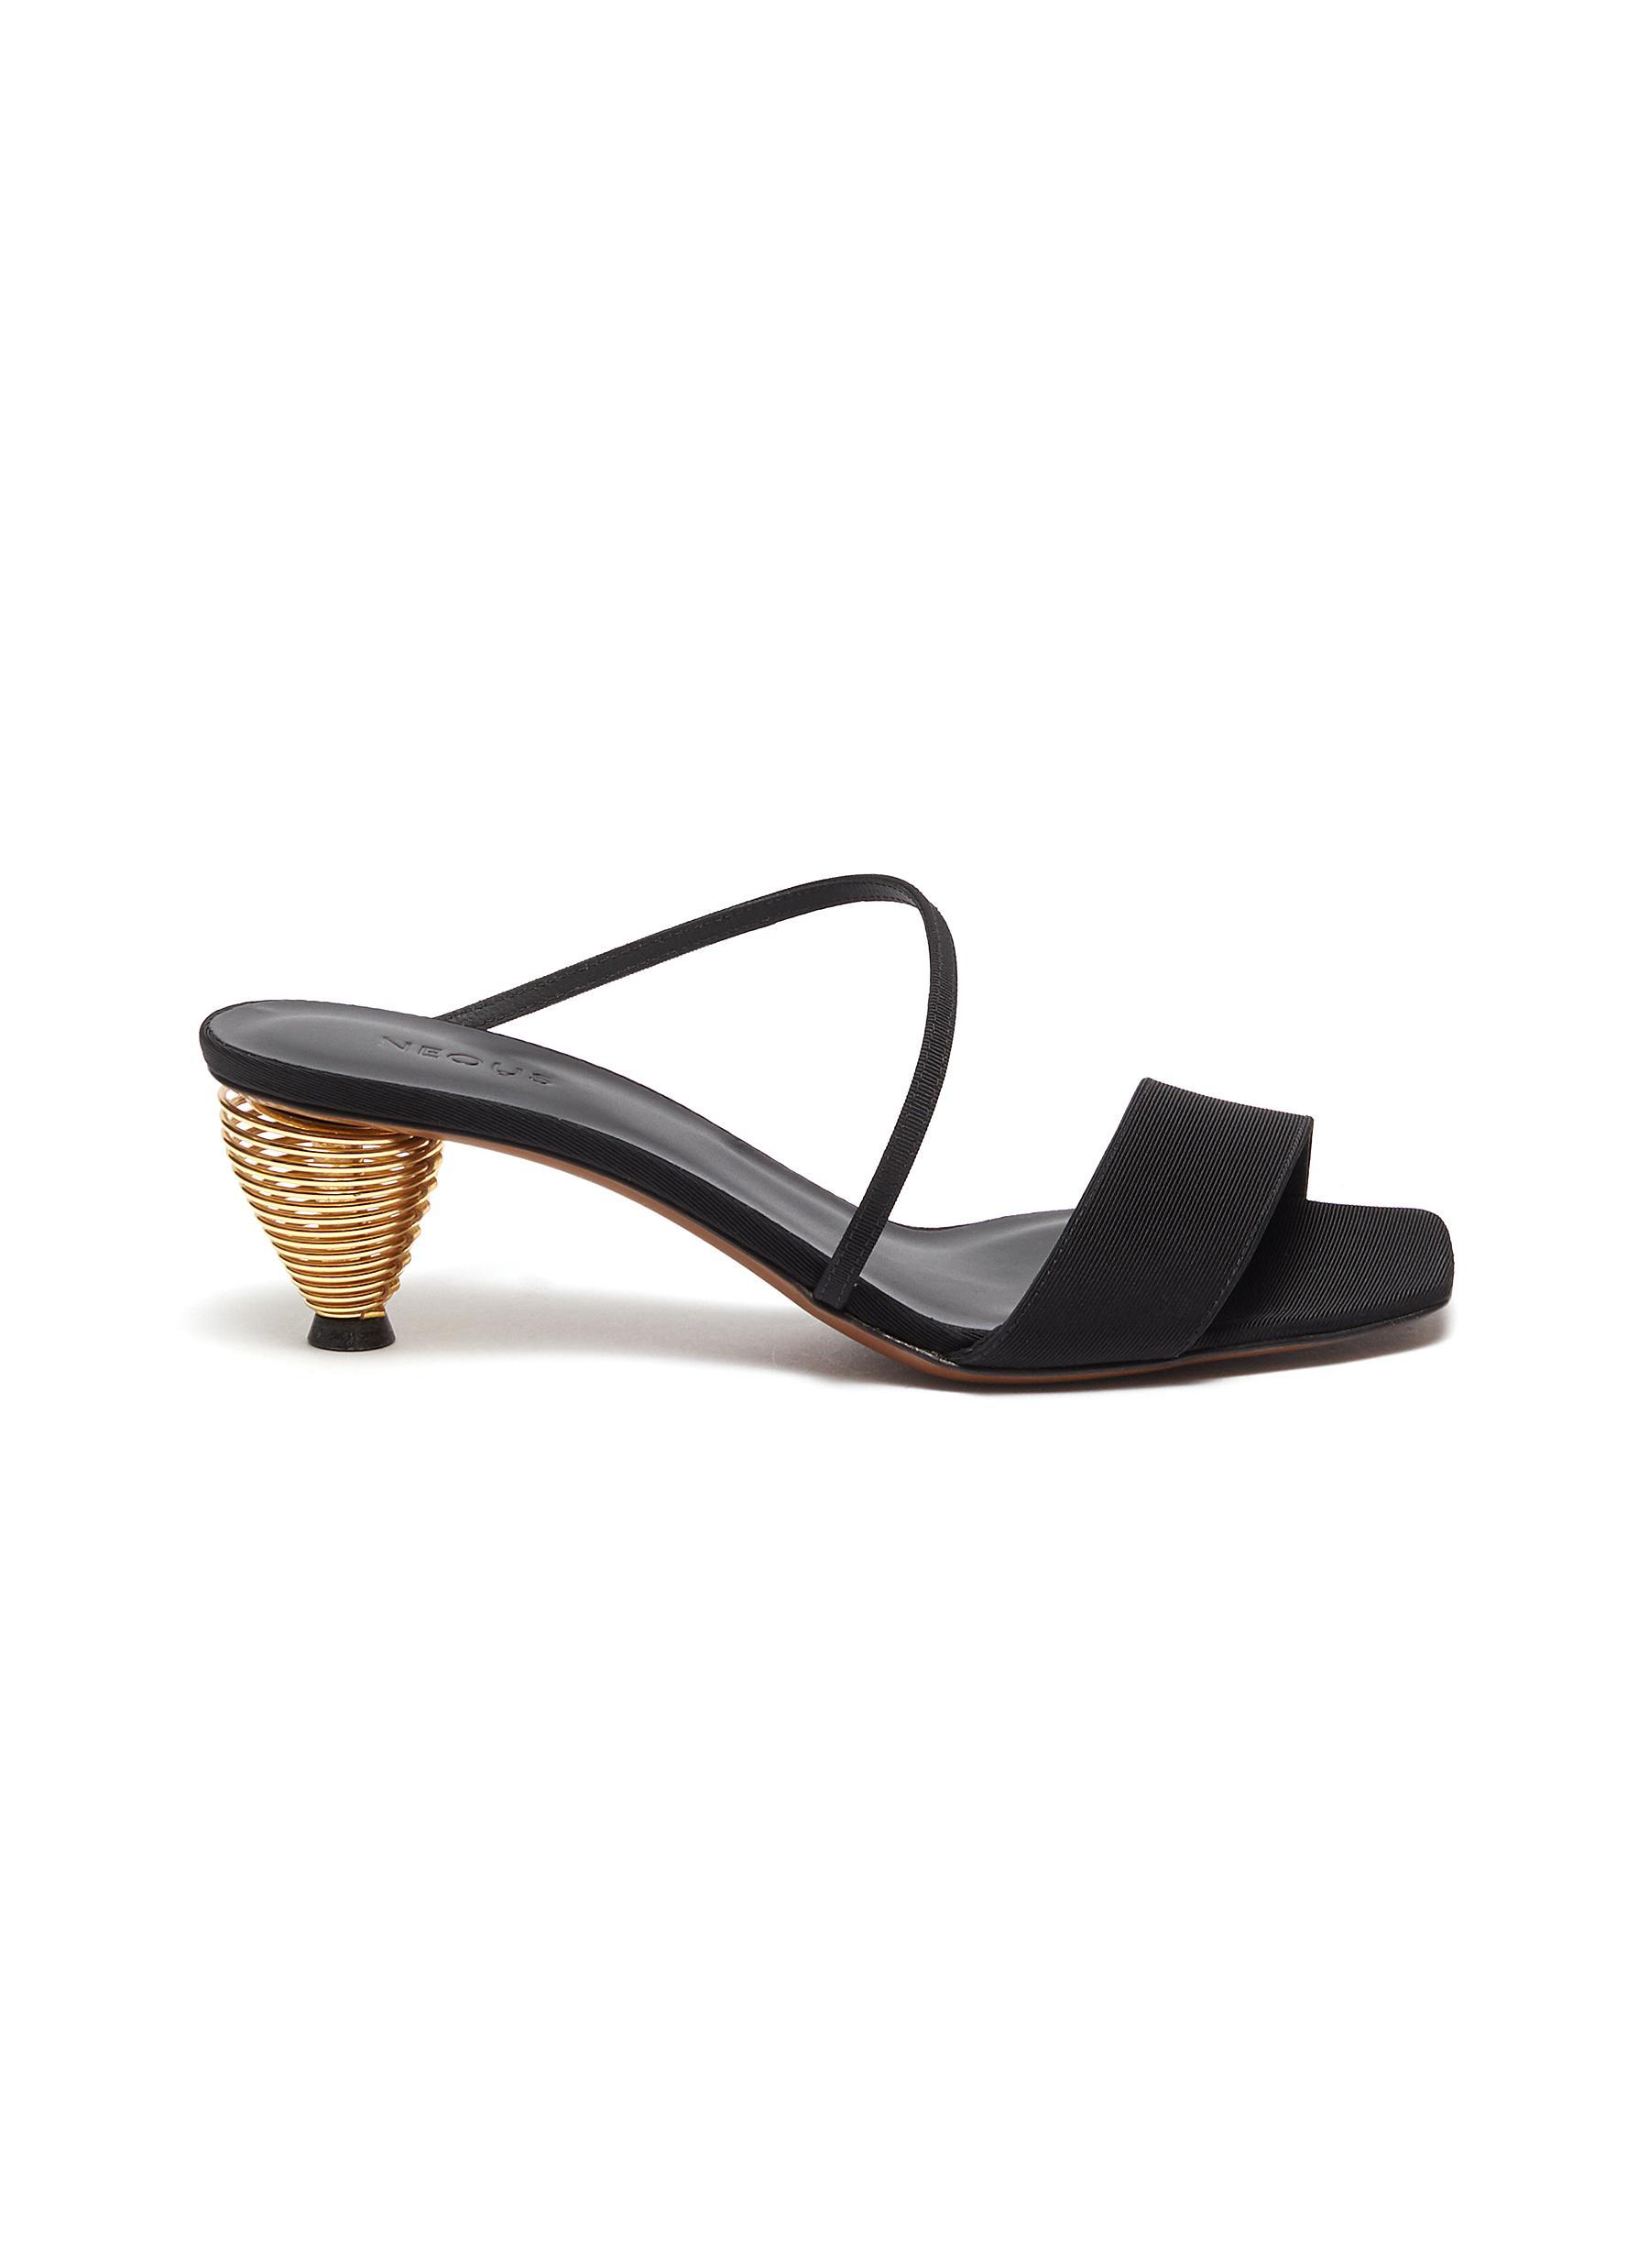 Thallis spiral metallic heel strappy sandals by Neous